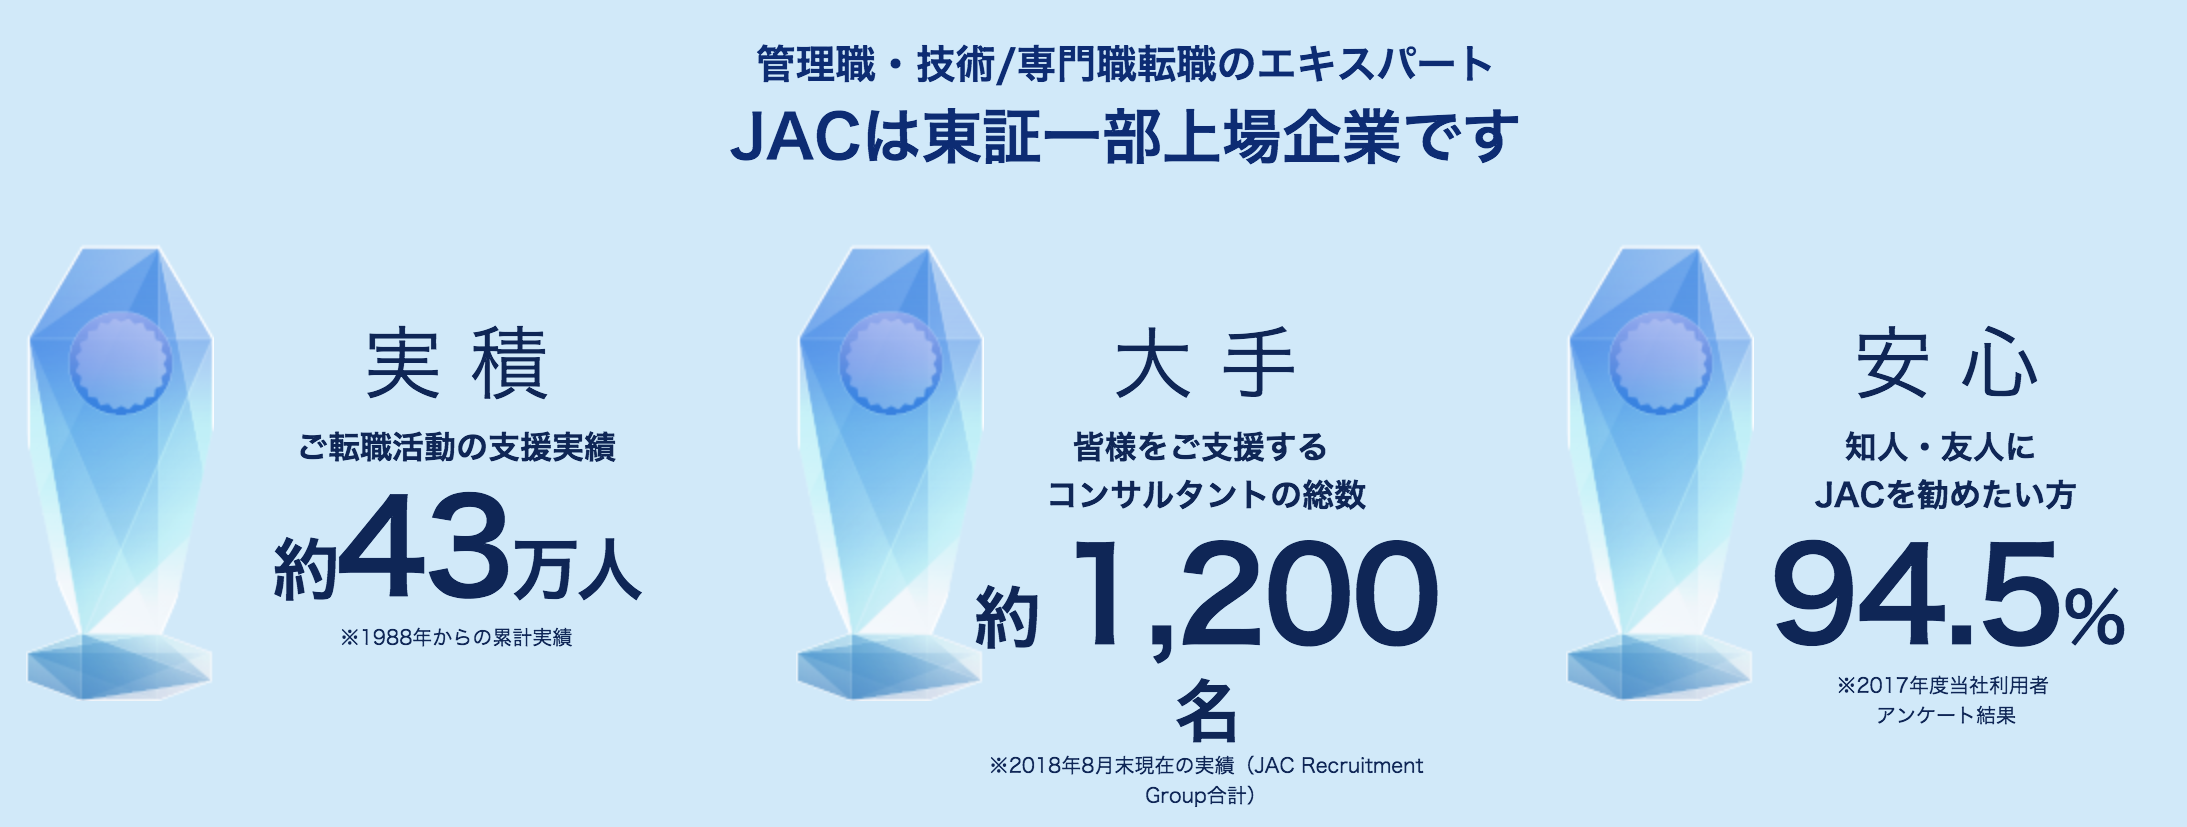 JACリクルートメントの特徴